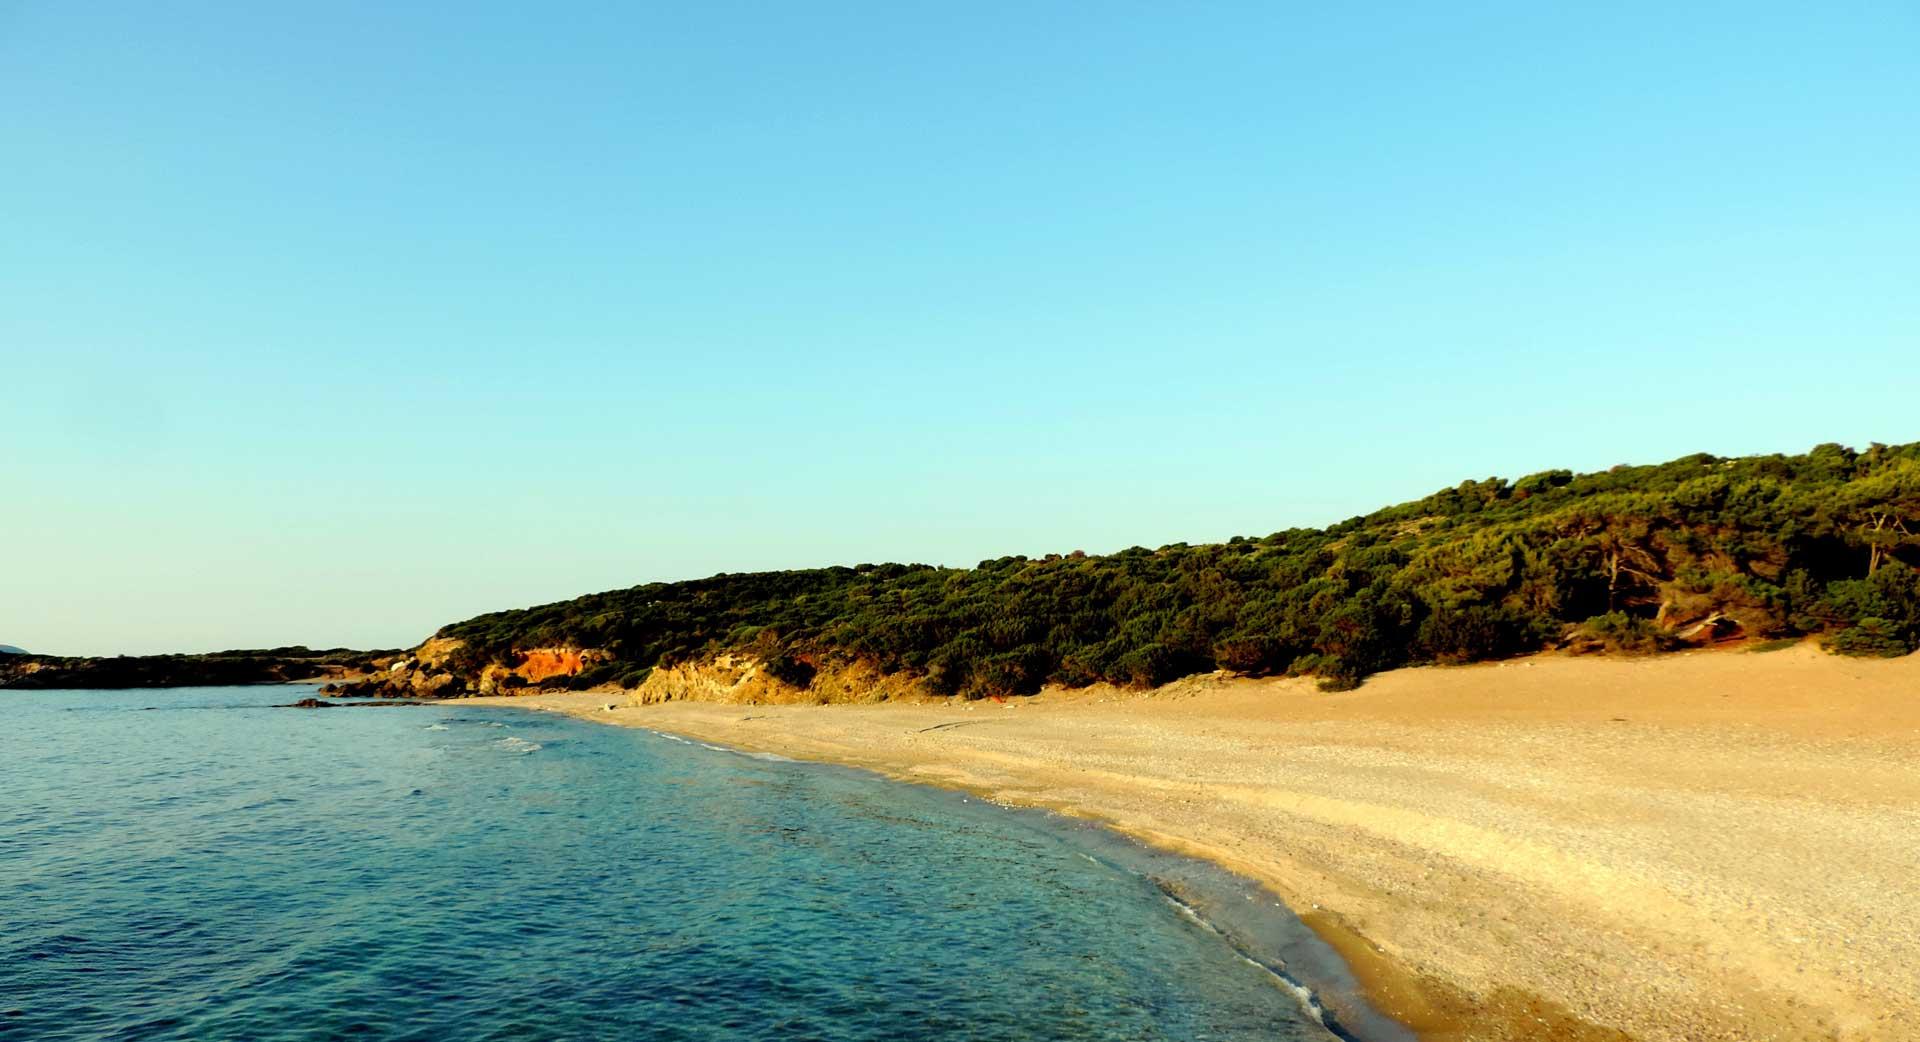 PINES ON A BEACH